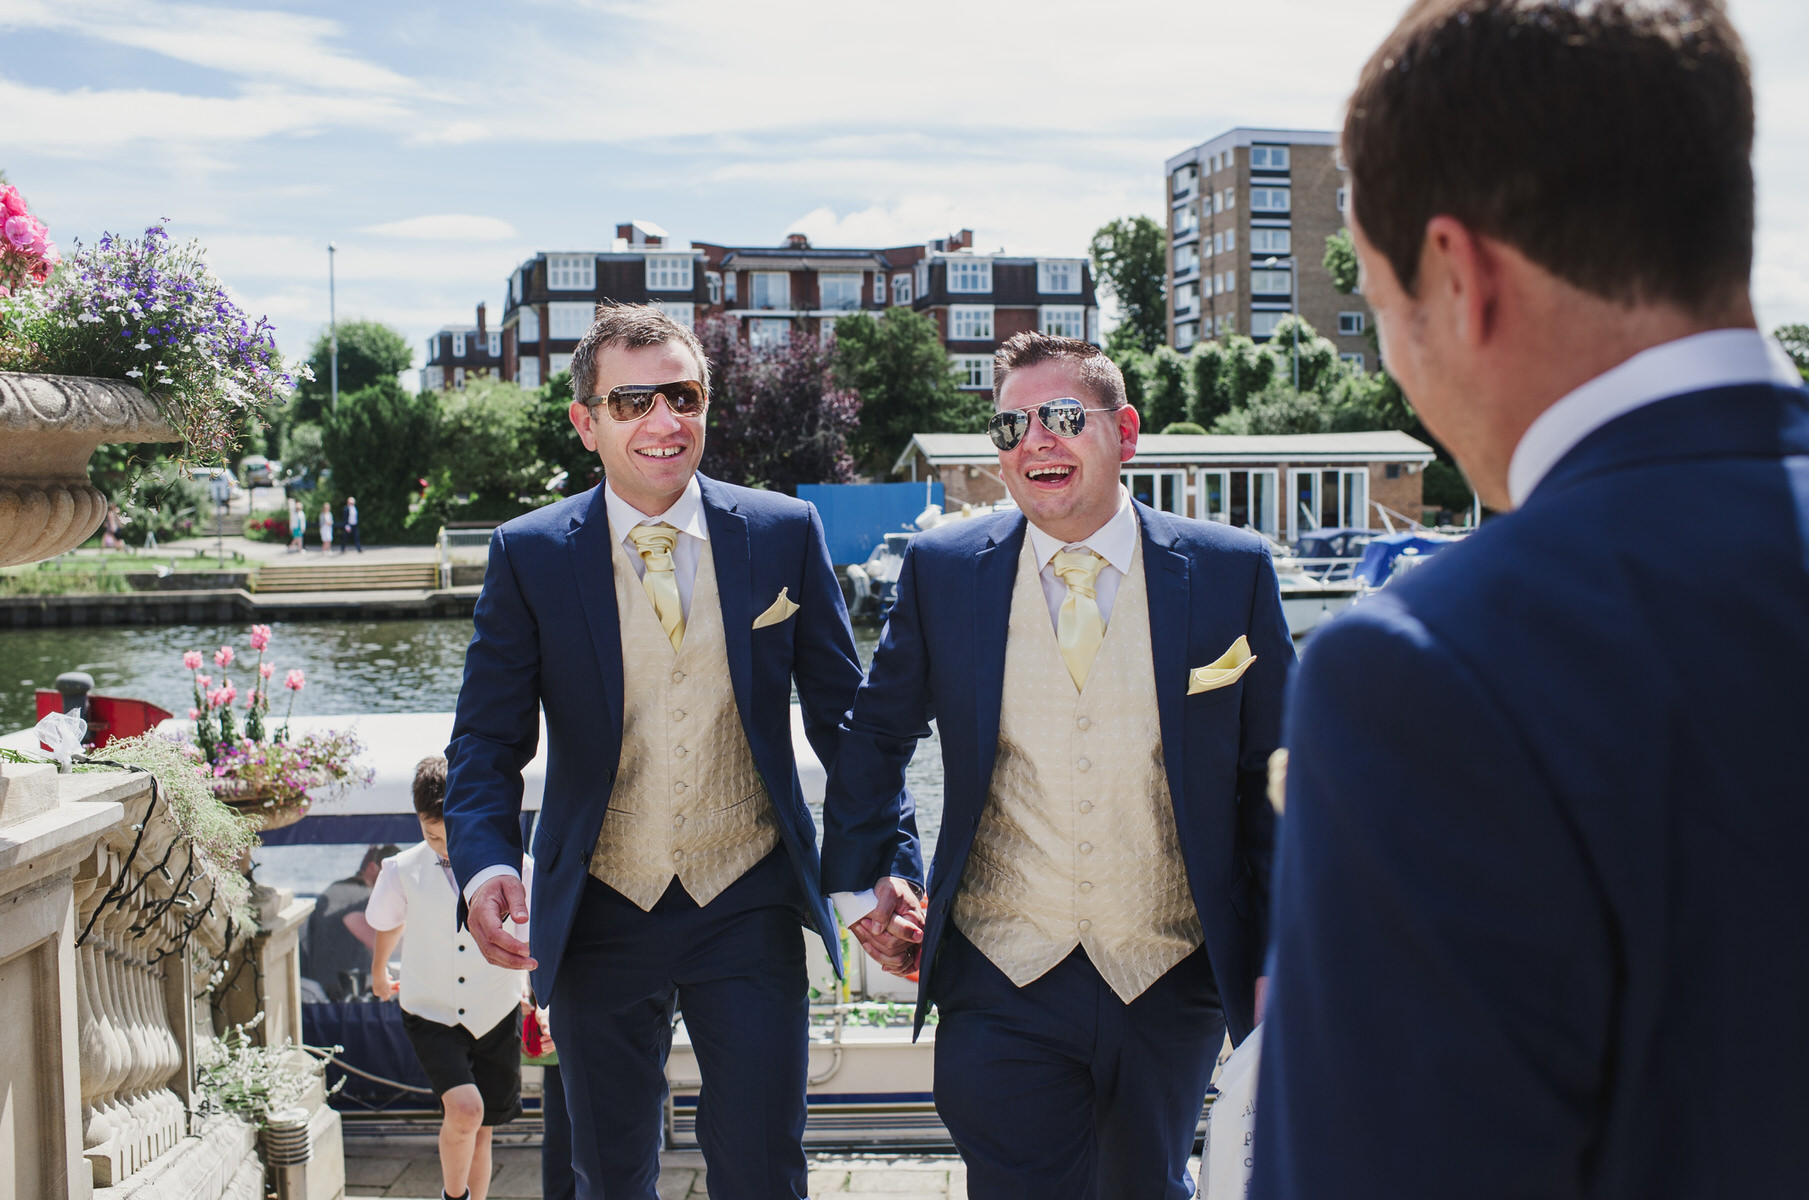 Ravens Ait wedding groom